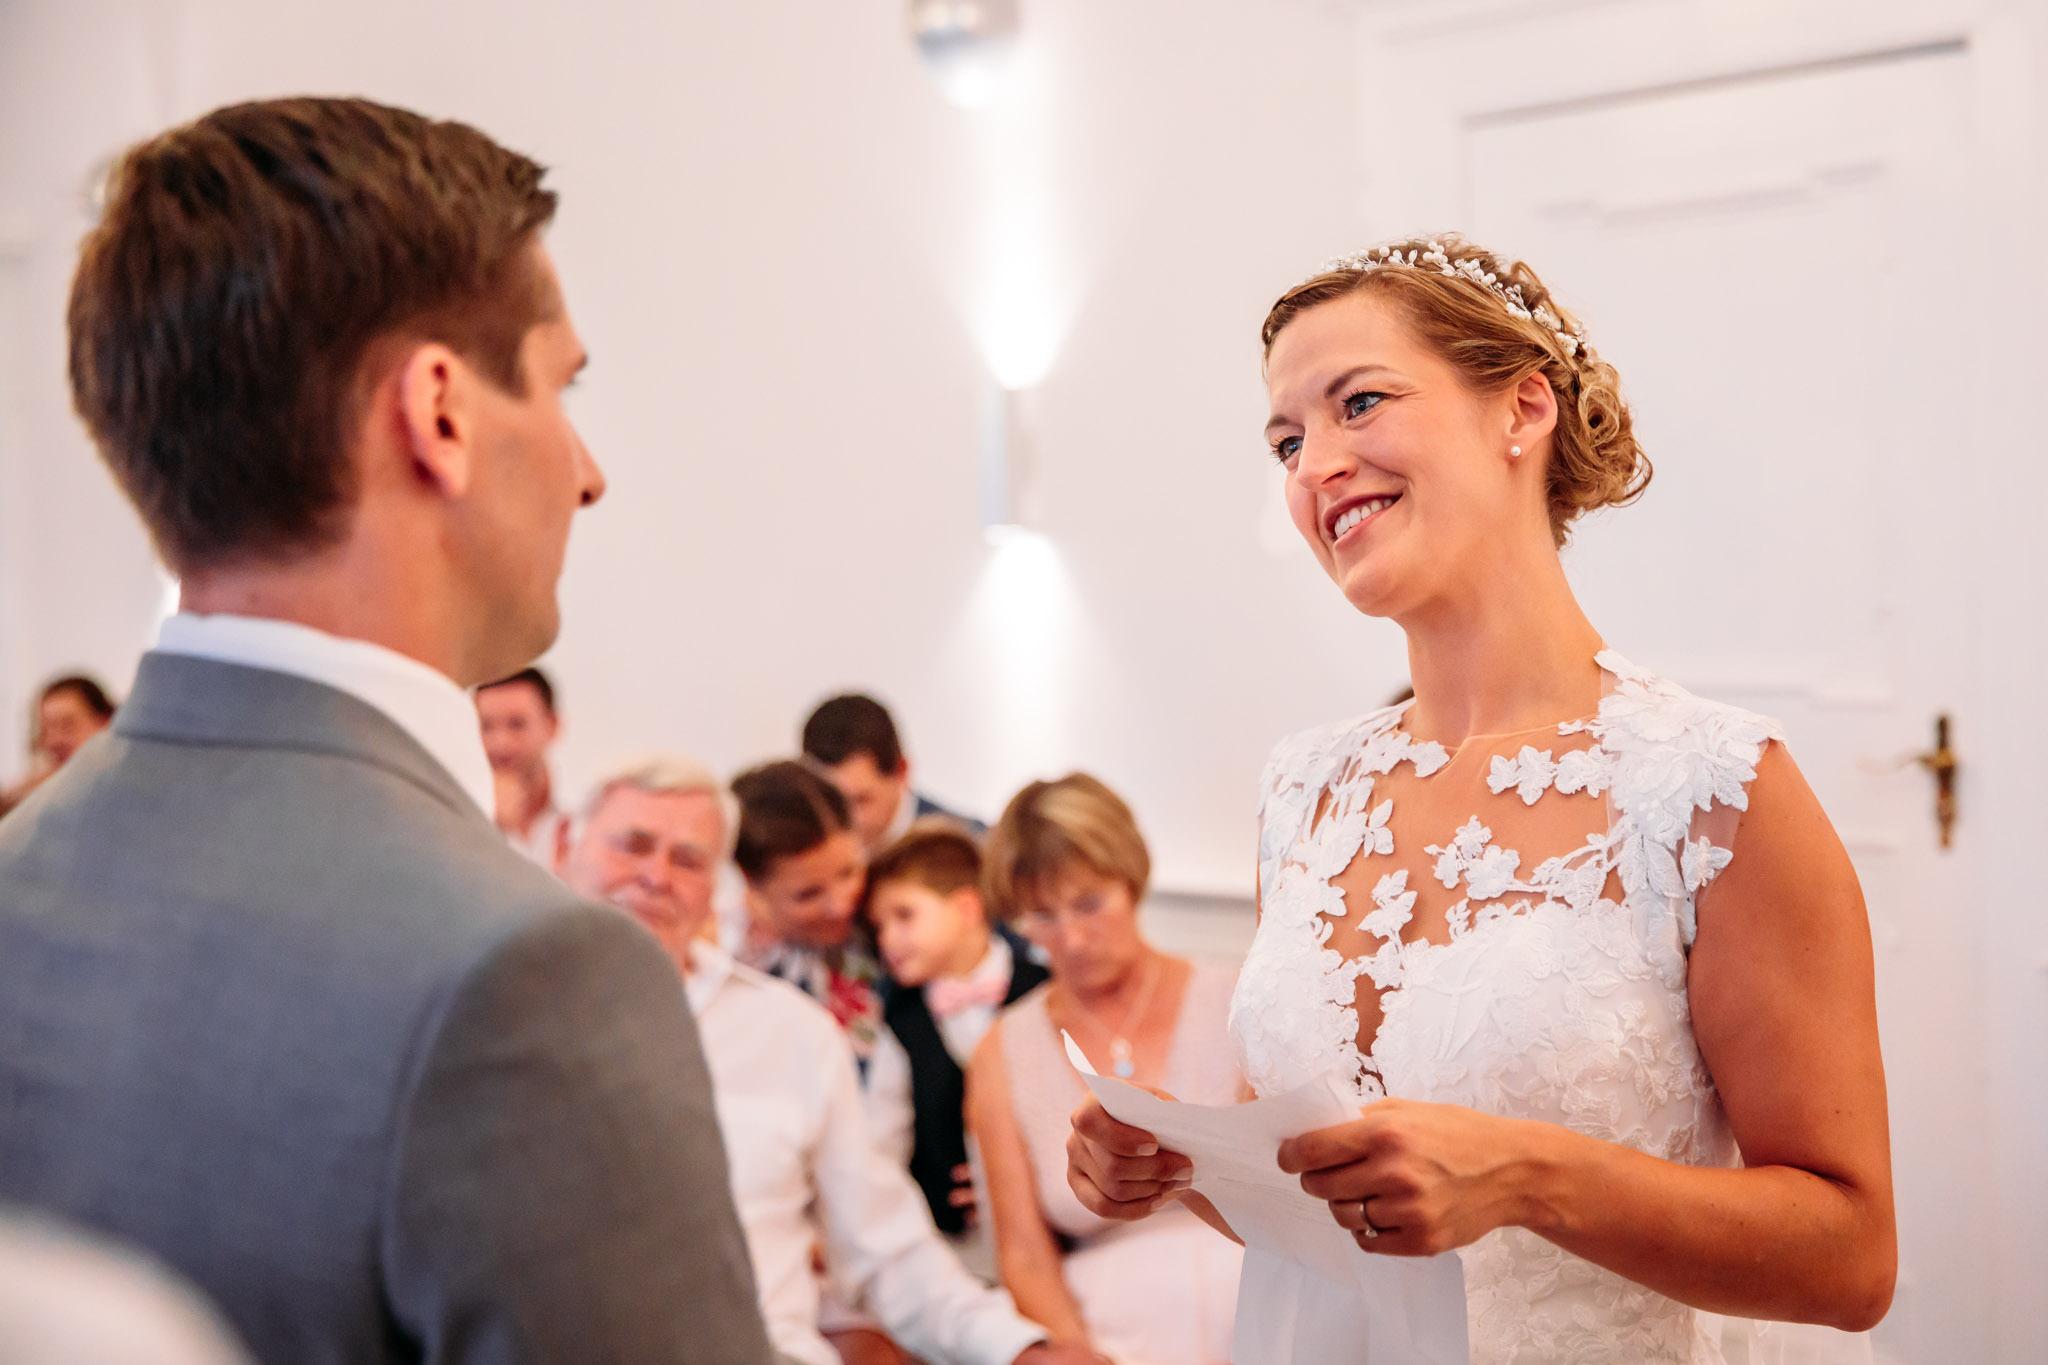 180818_Hochzeit_german_american_grunewald_berlin_locanda_12_apostoli_wedding_web_0007.jpg